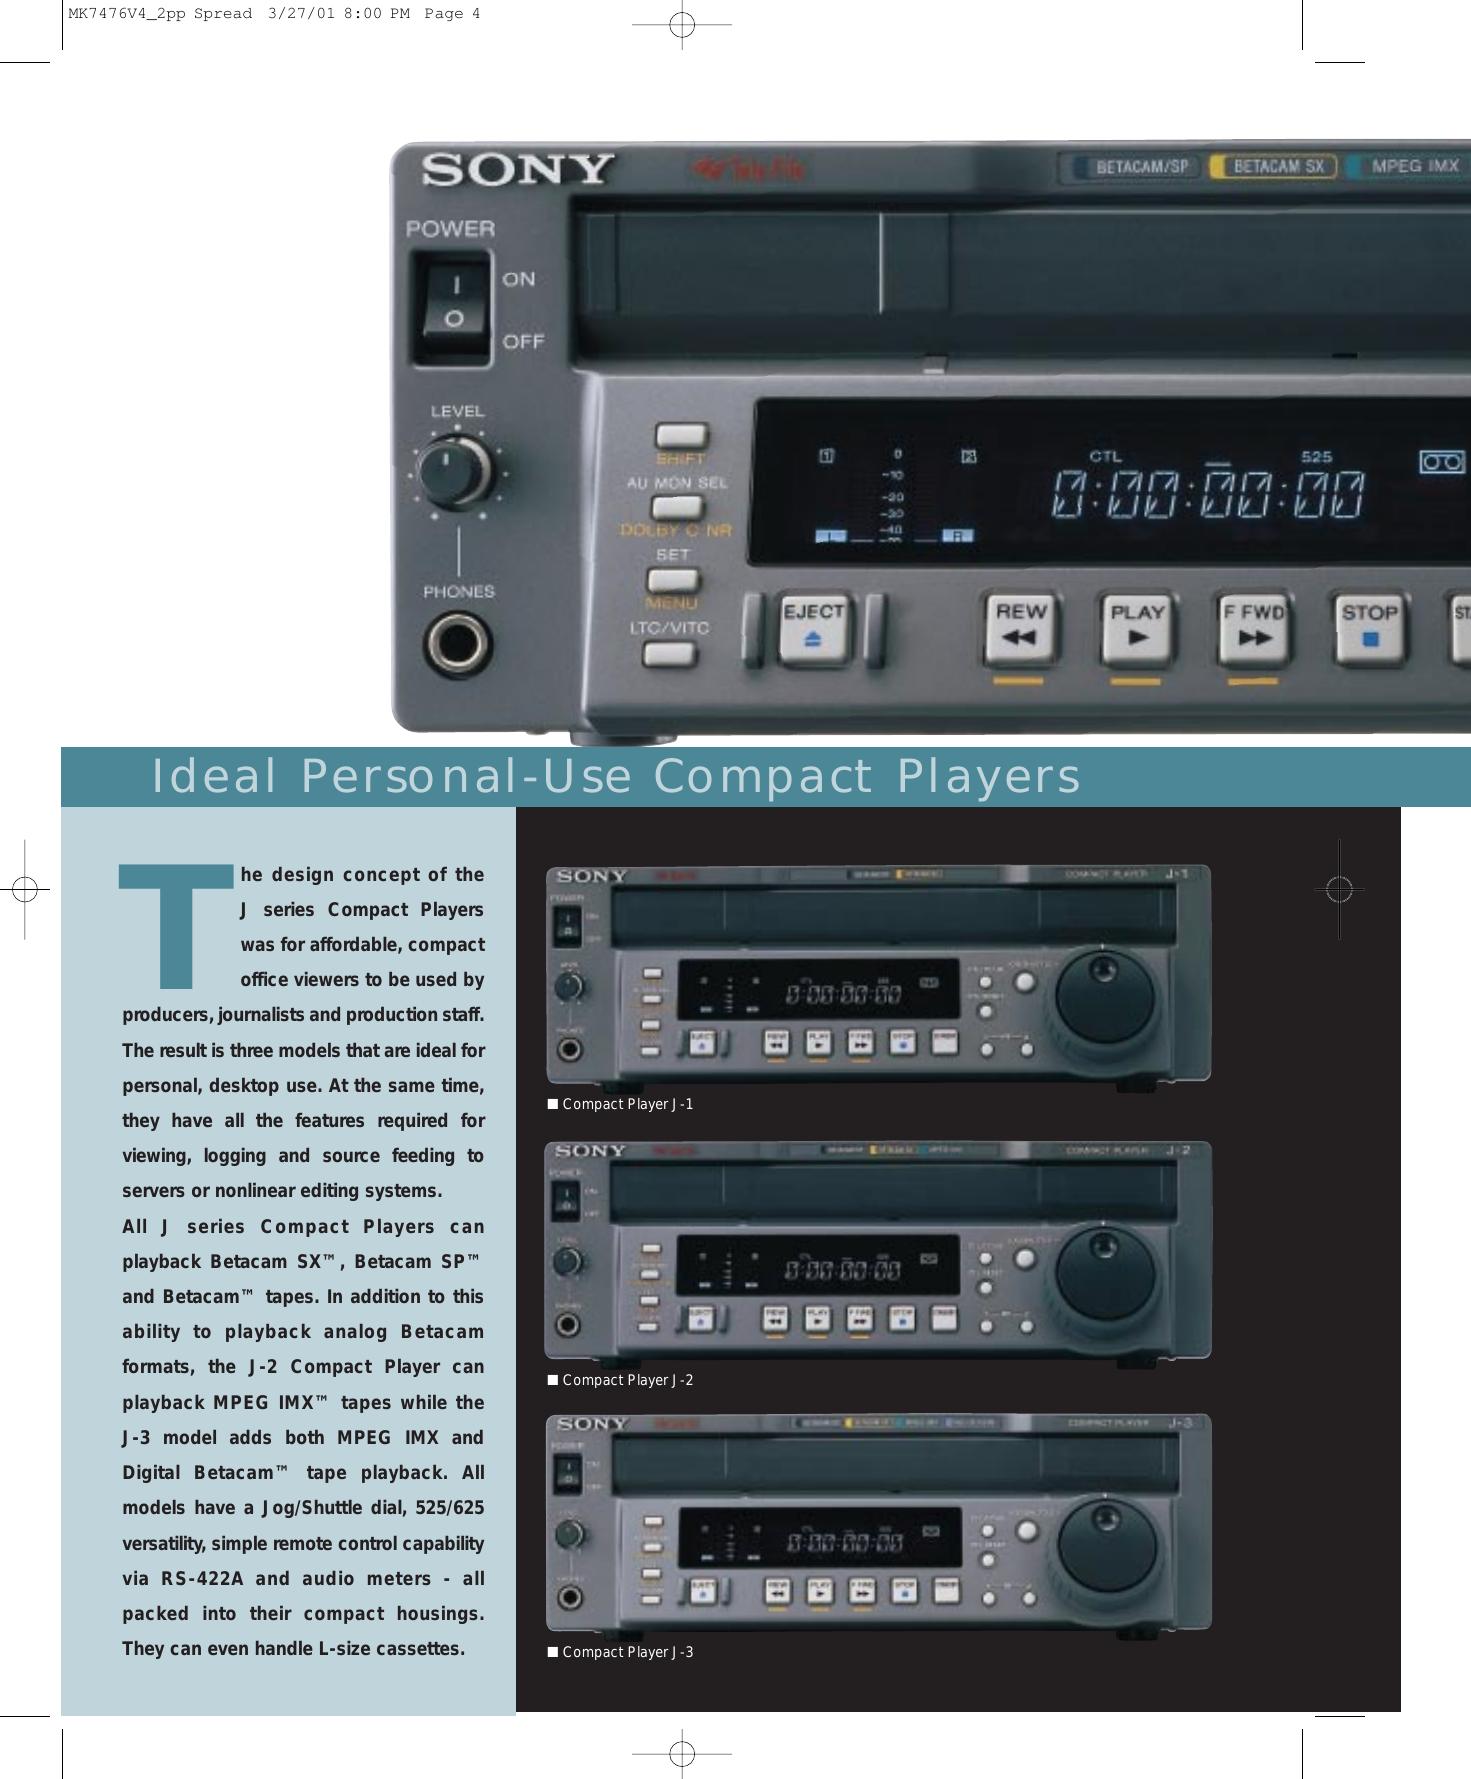 Sony Car Audio Manuals R33gtraudiowiringdiagram R33 Gtr Project Animal Array Stereo System J 1 Users Manual Mk7476v3 9 Rh Usermanual Wiki